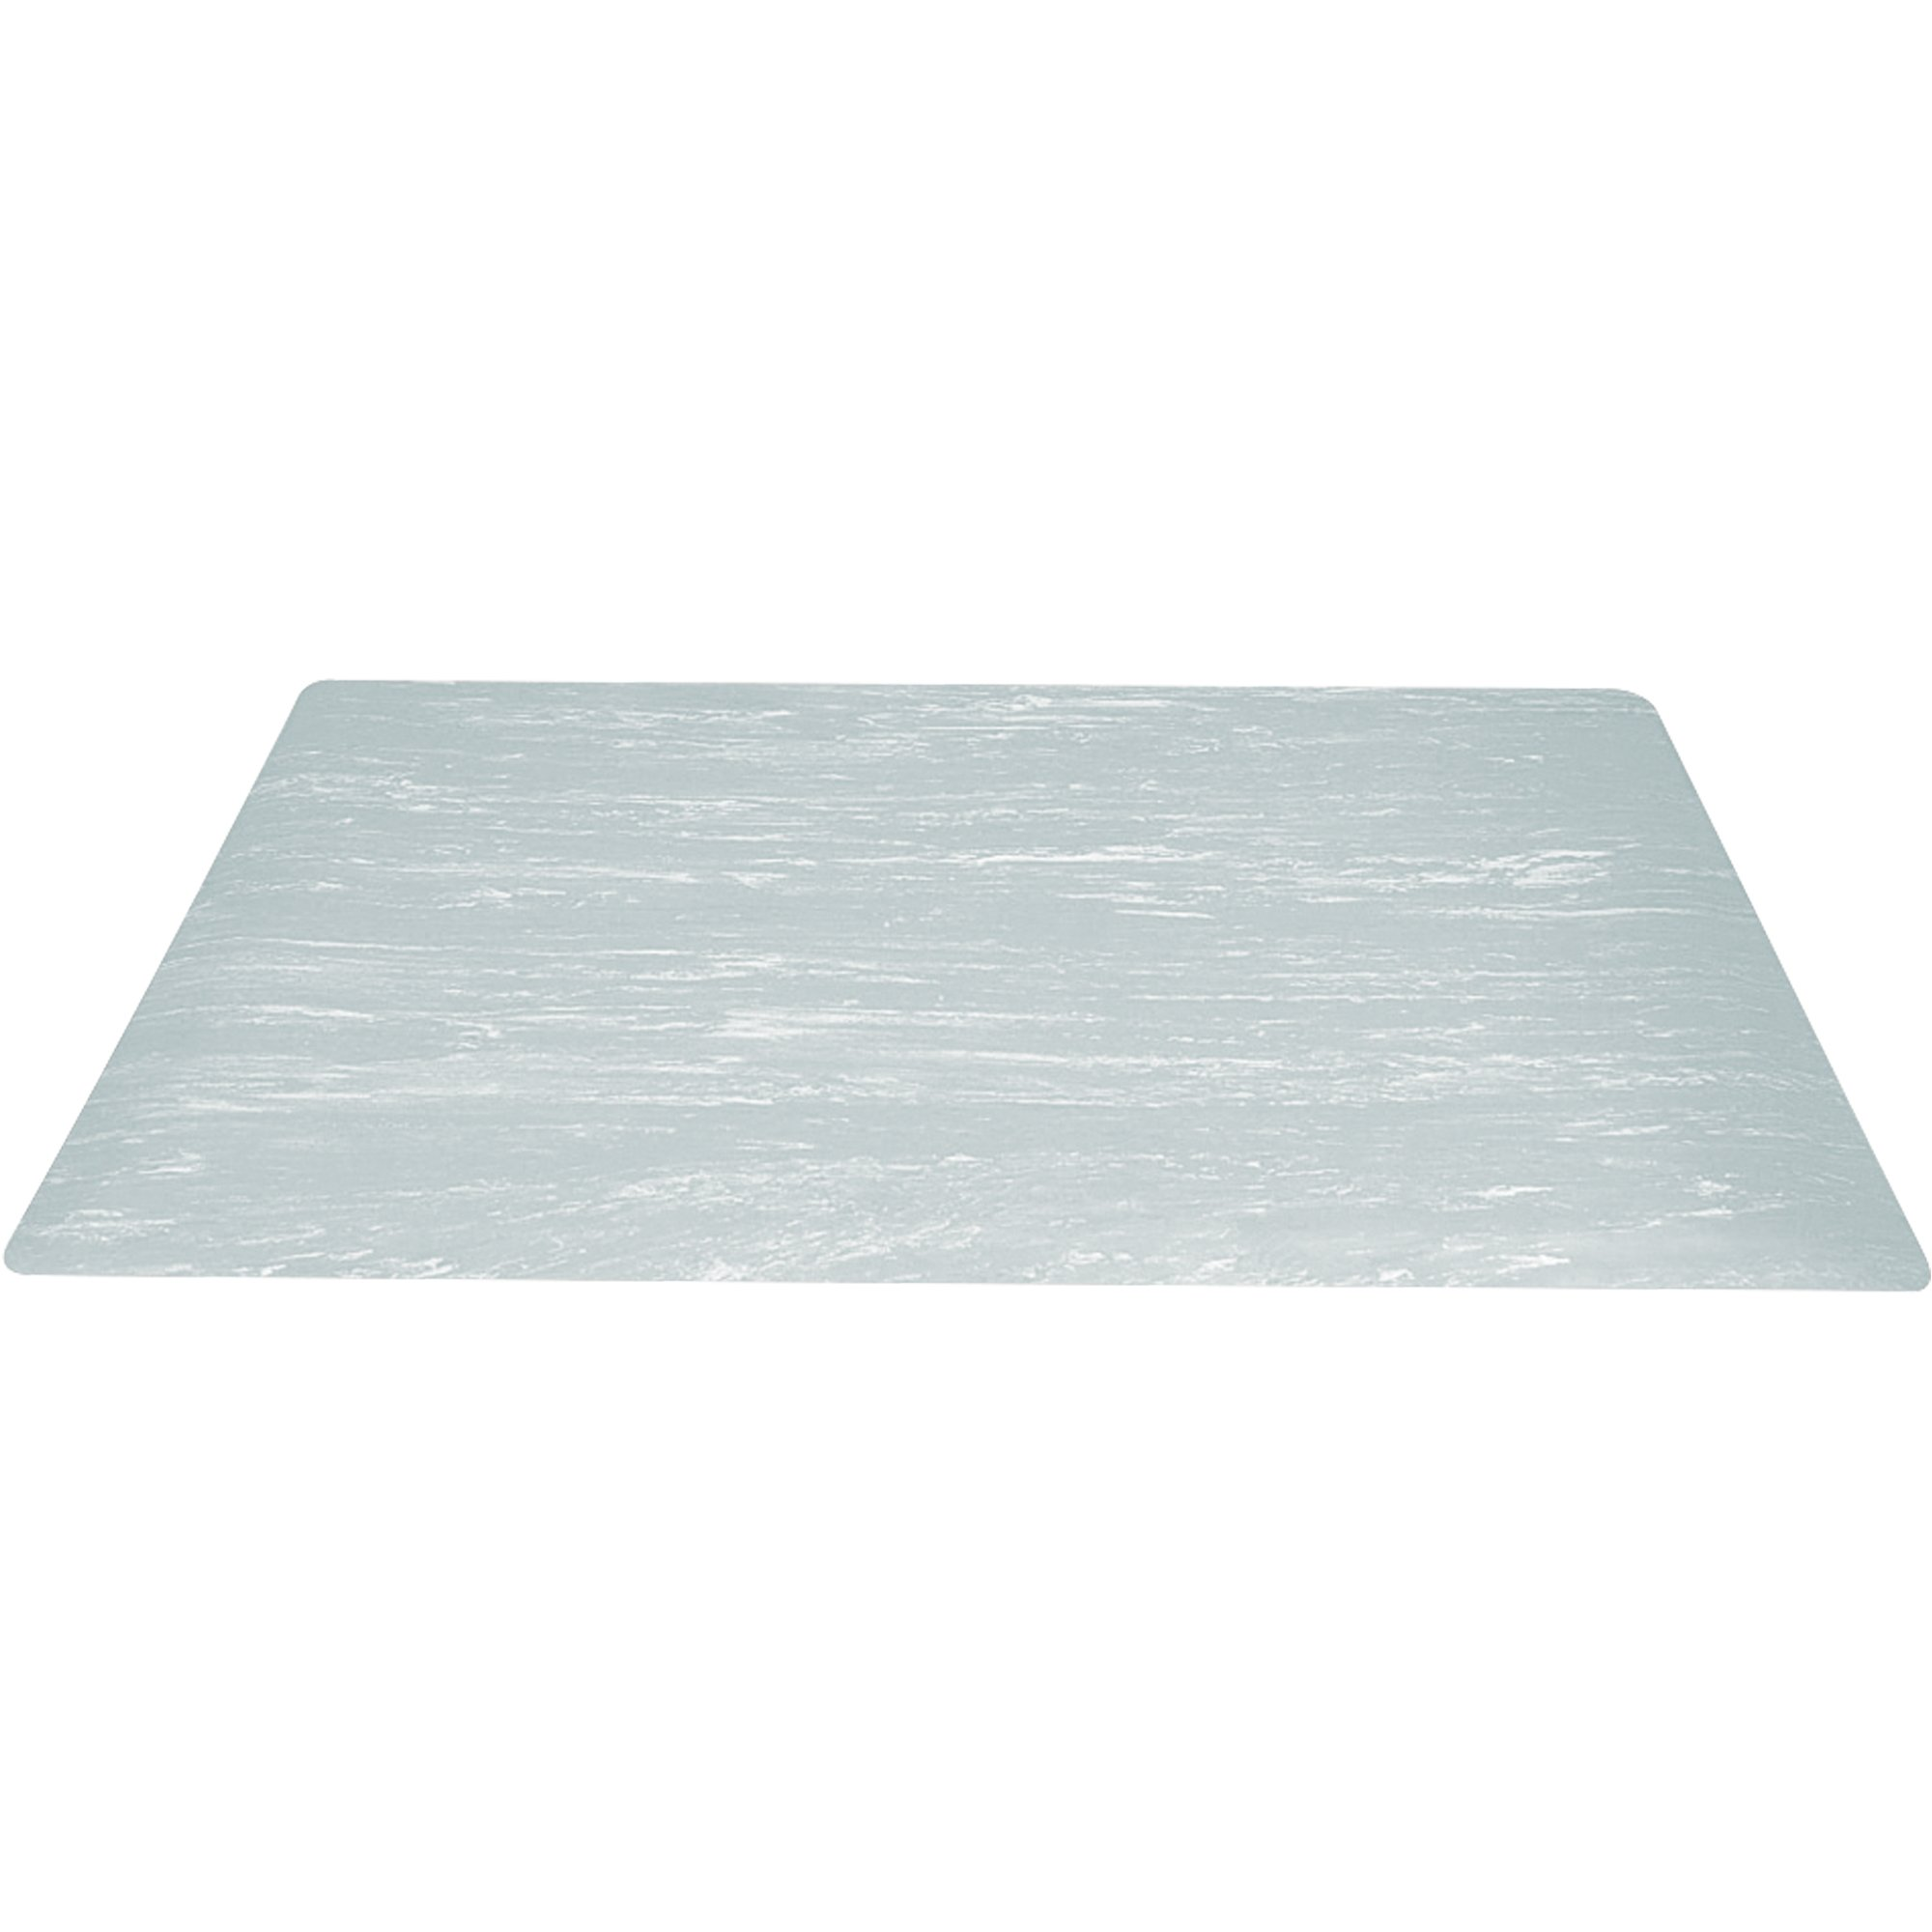 4 x 6' Gray Marble Anti-Fatigue Mat